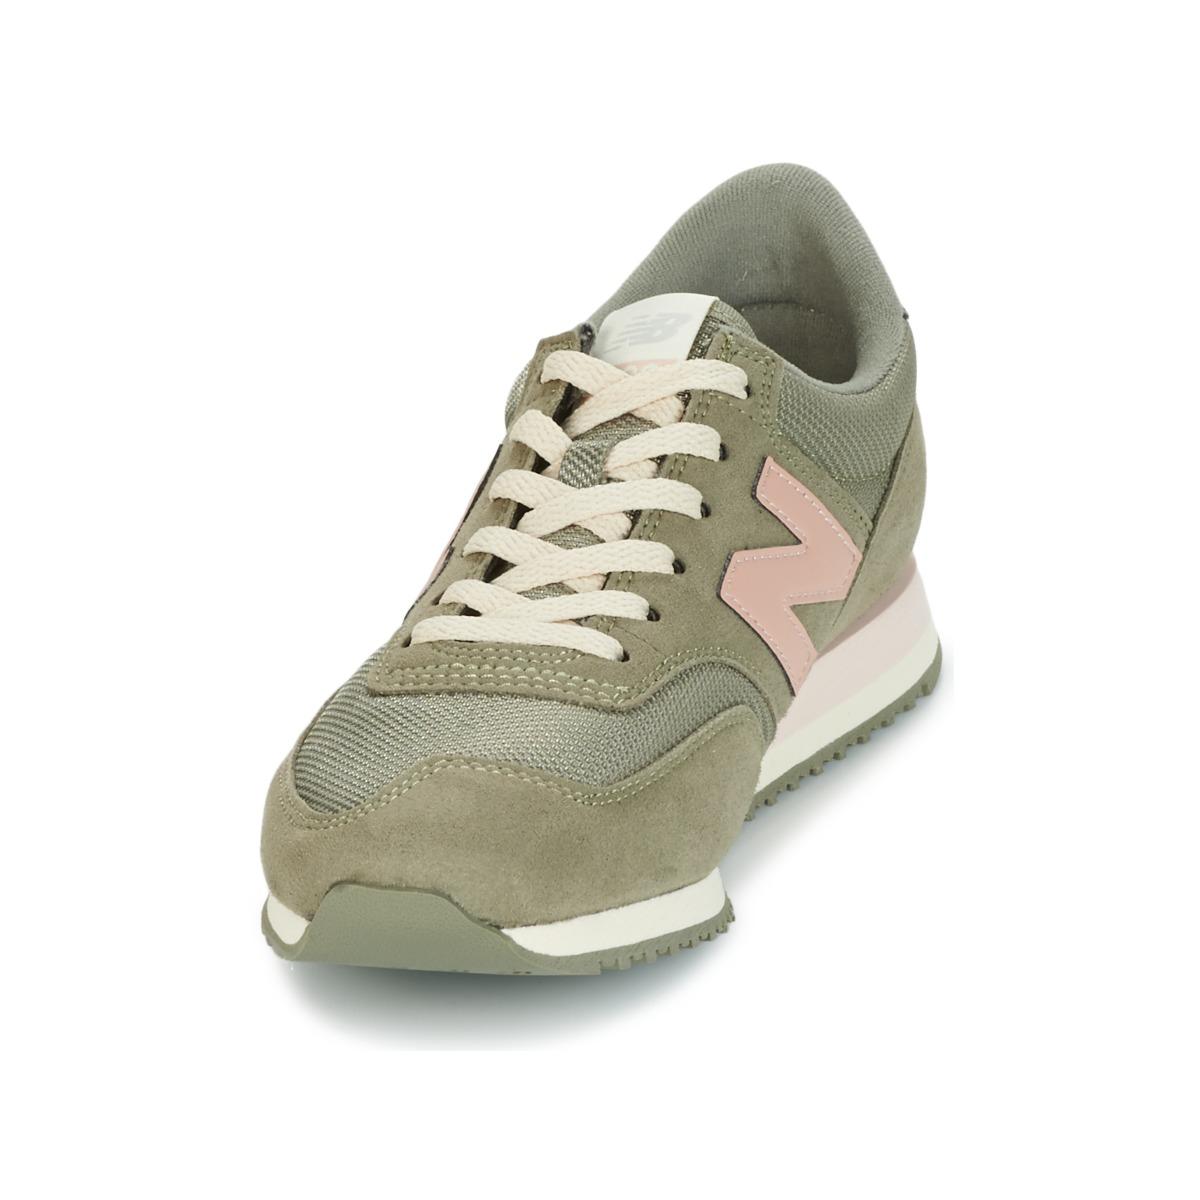 2c1e25ccb0df 50%OFF New Balance CW620 KAKI Shoes Low top trainers Women ...